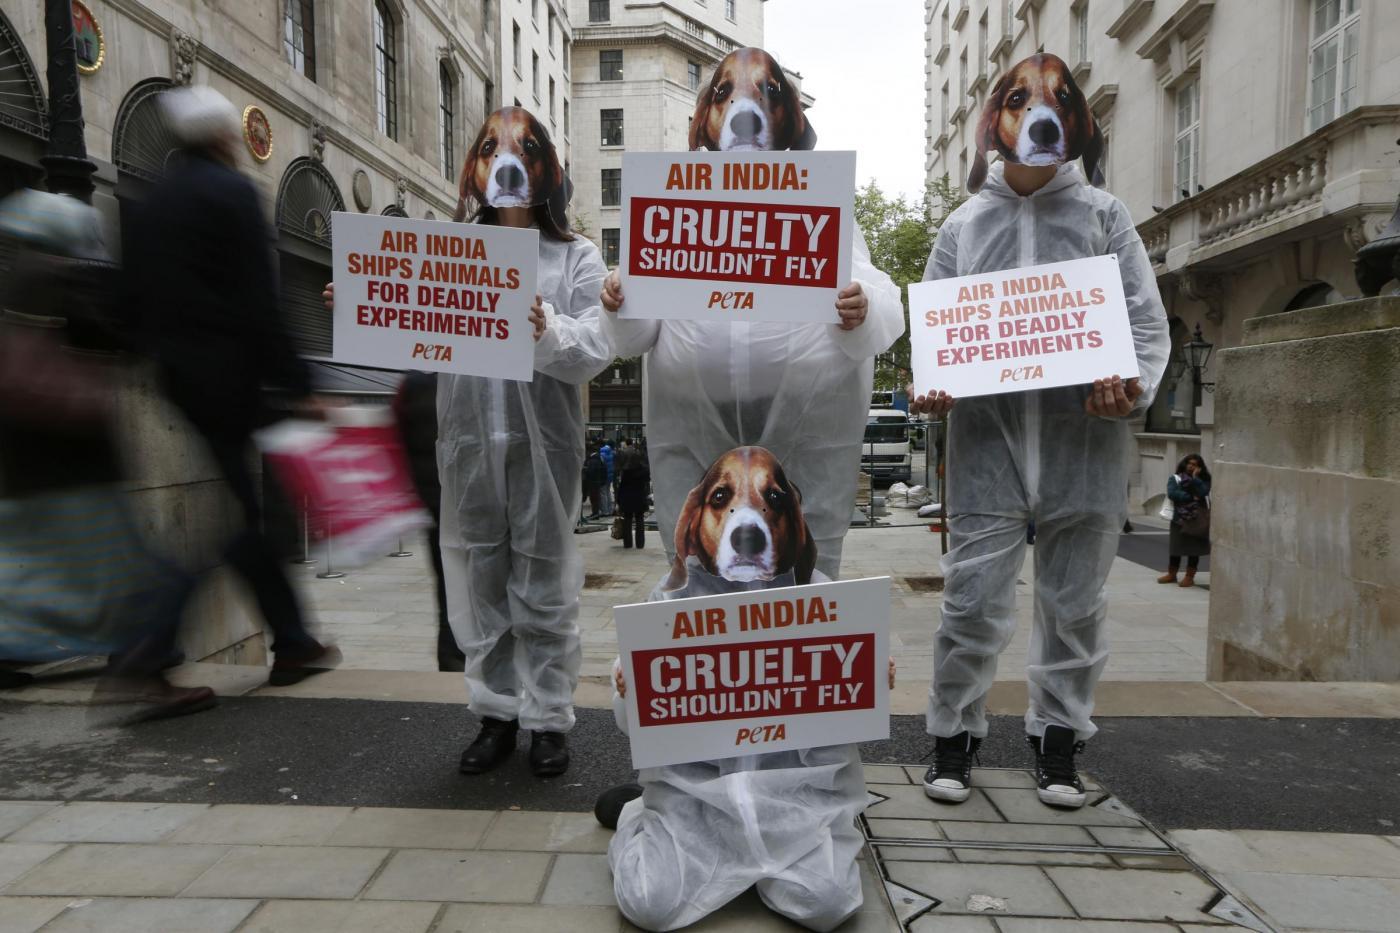 Proteste di PETA contro Air India a Londra02